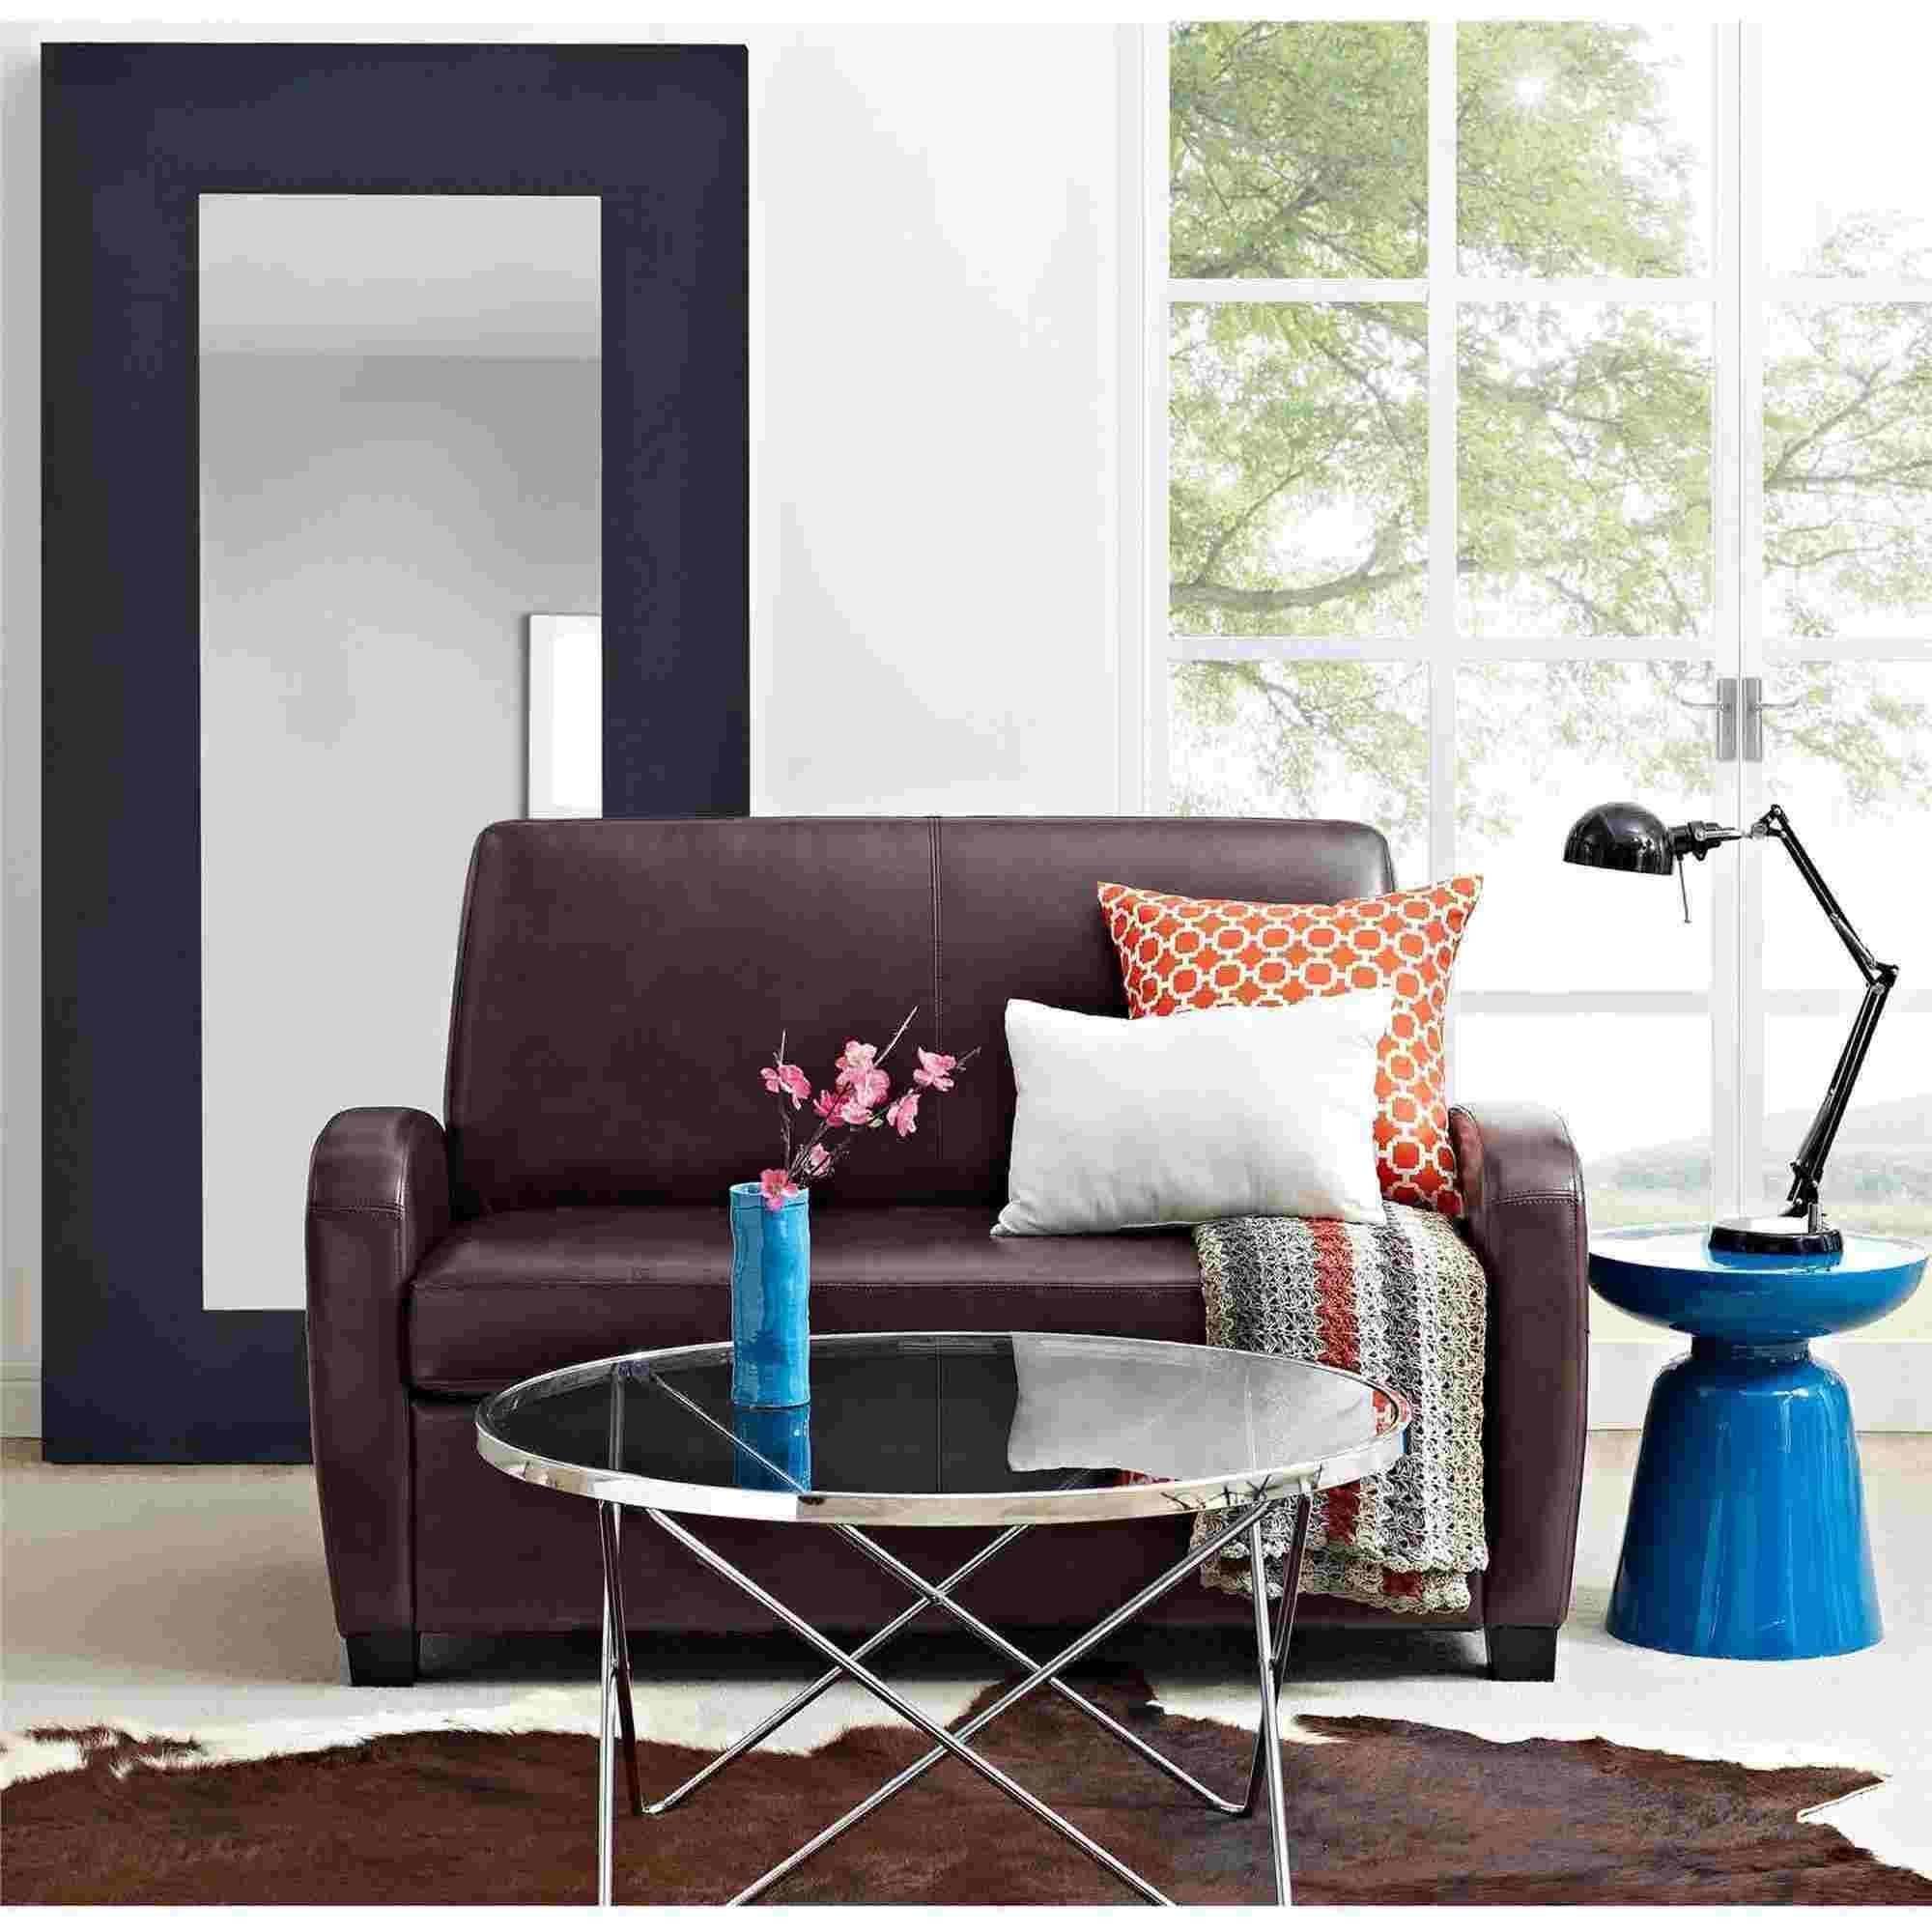 Mainstays Sofa Sleeper, Black – Walmart With Regard To Mainstays Sleeper Sofas (Image 17 of 20)